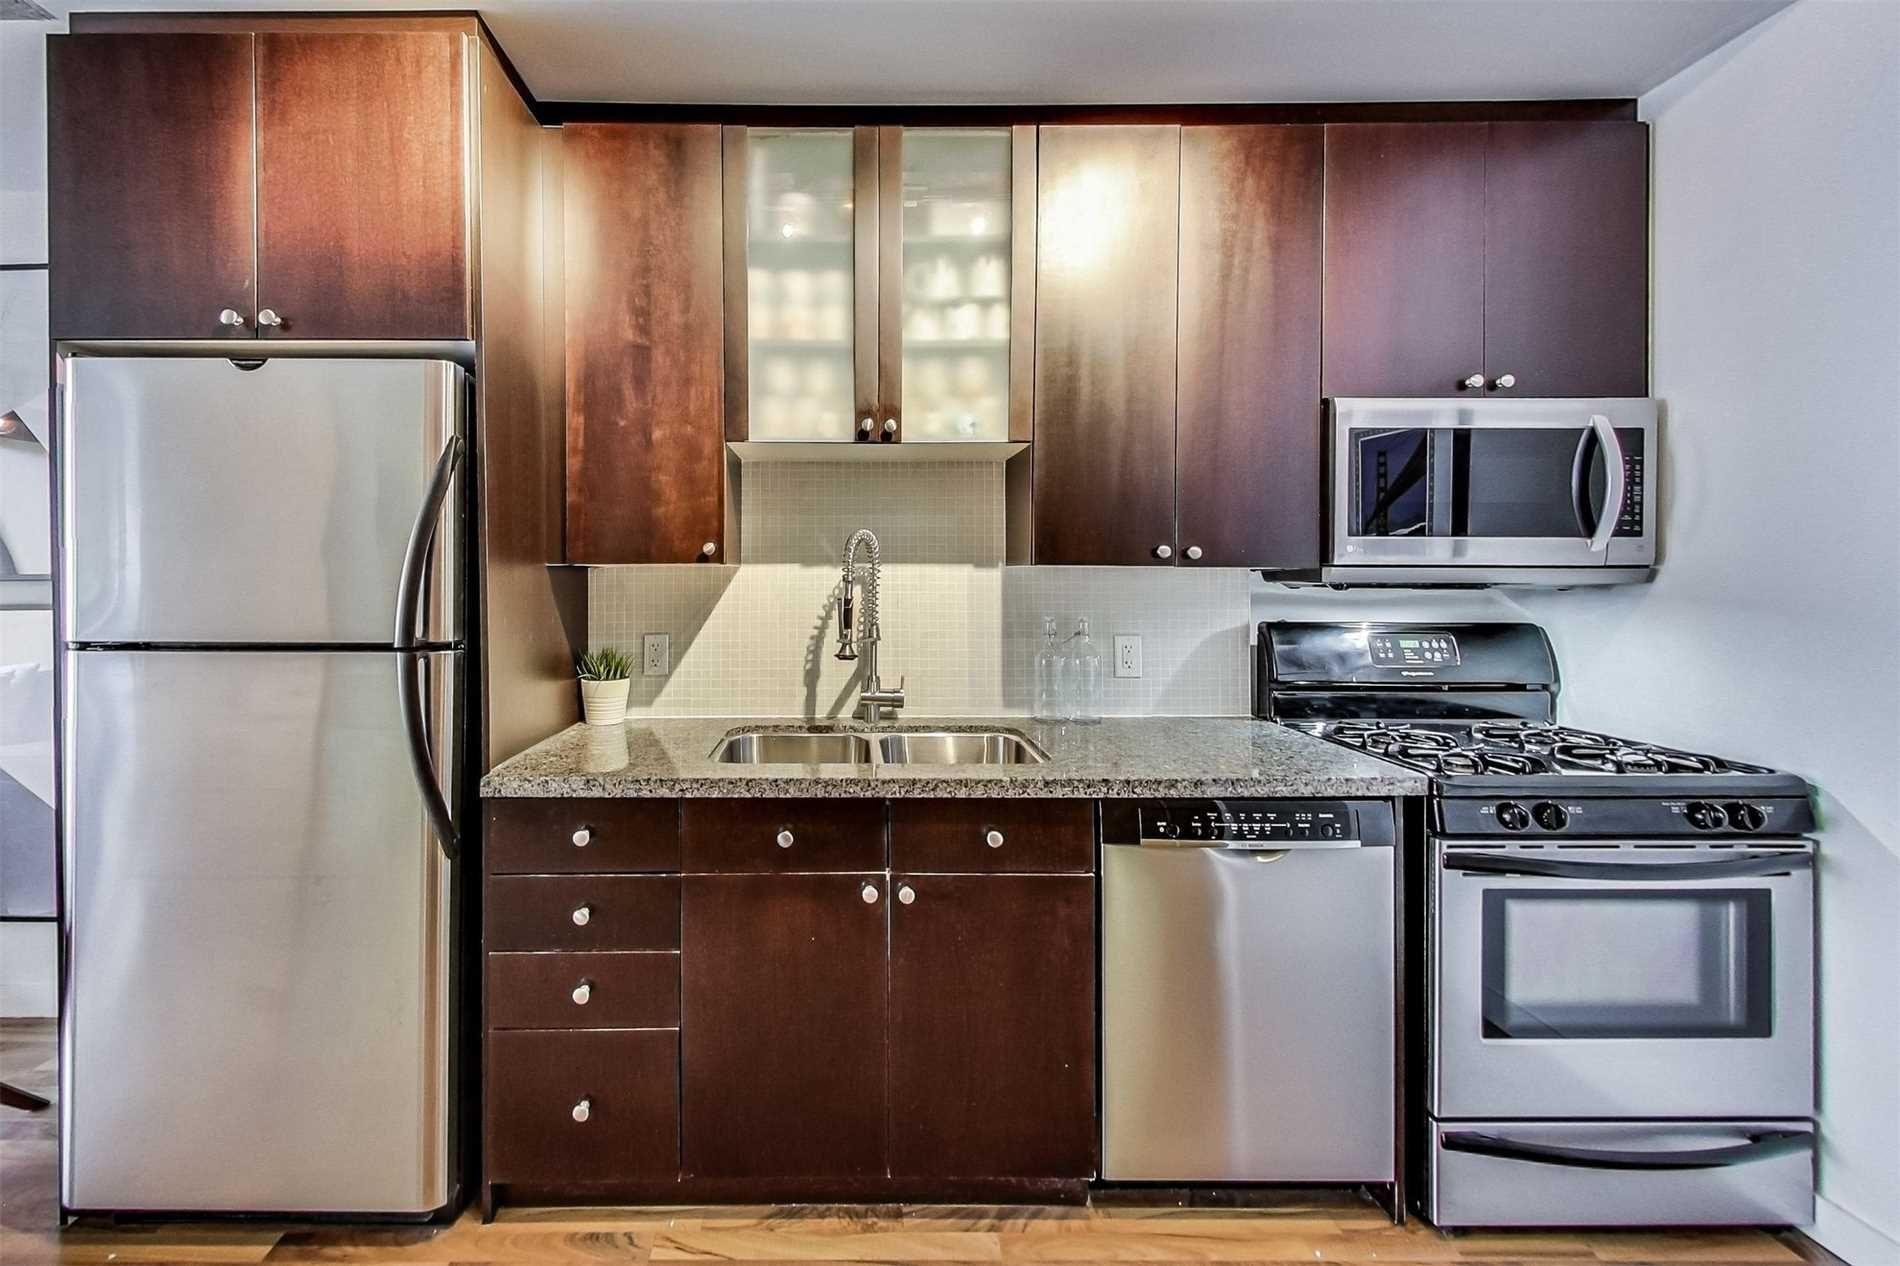 Photo 5: Photos: 307 1 Shaw Street in Toronto: Niagara Condo for sale (Toronto C01)  : MLS®# C4525736